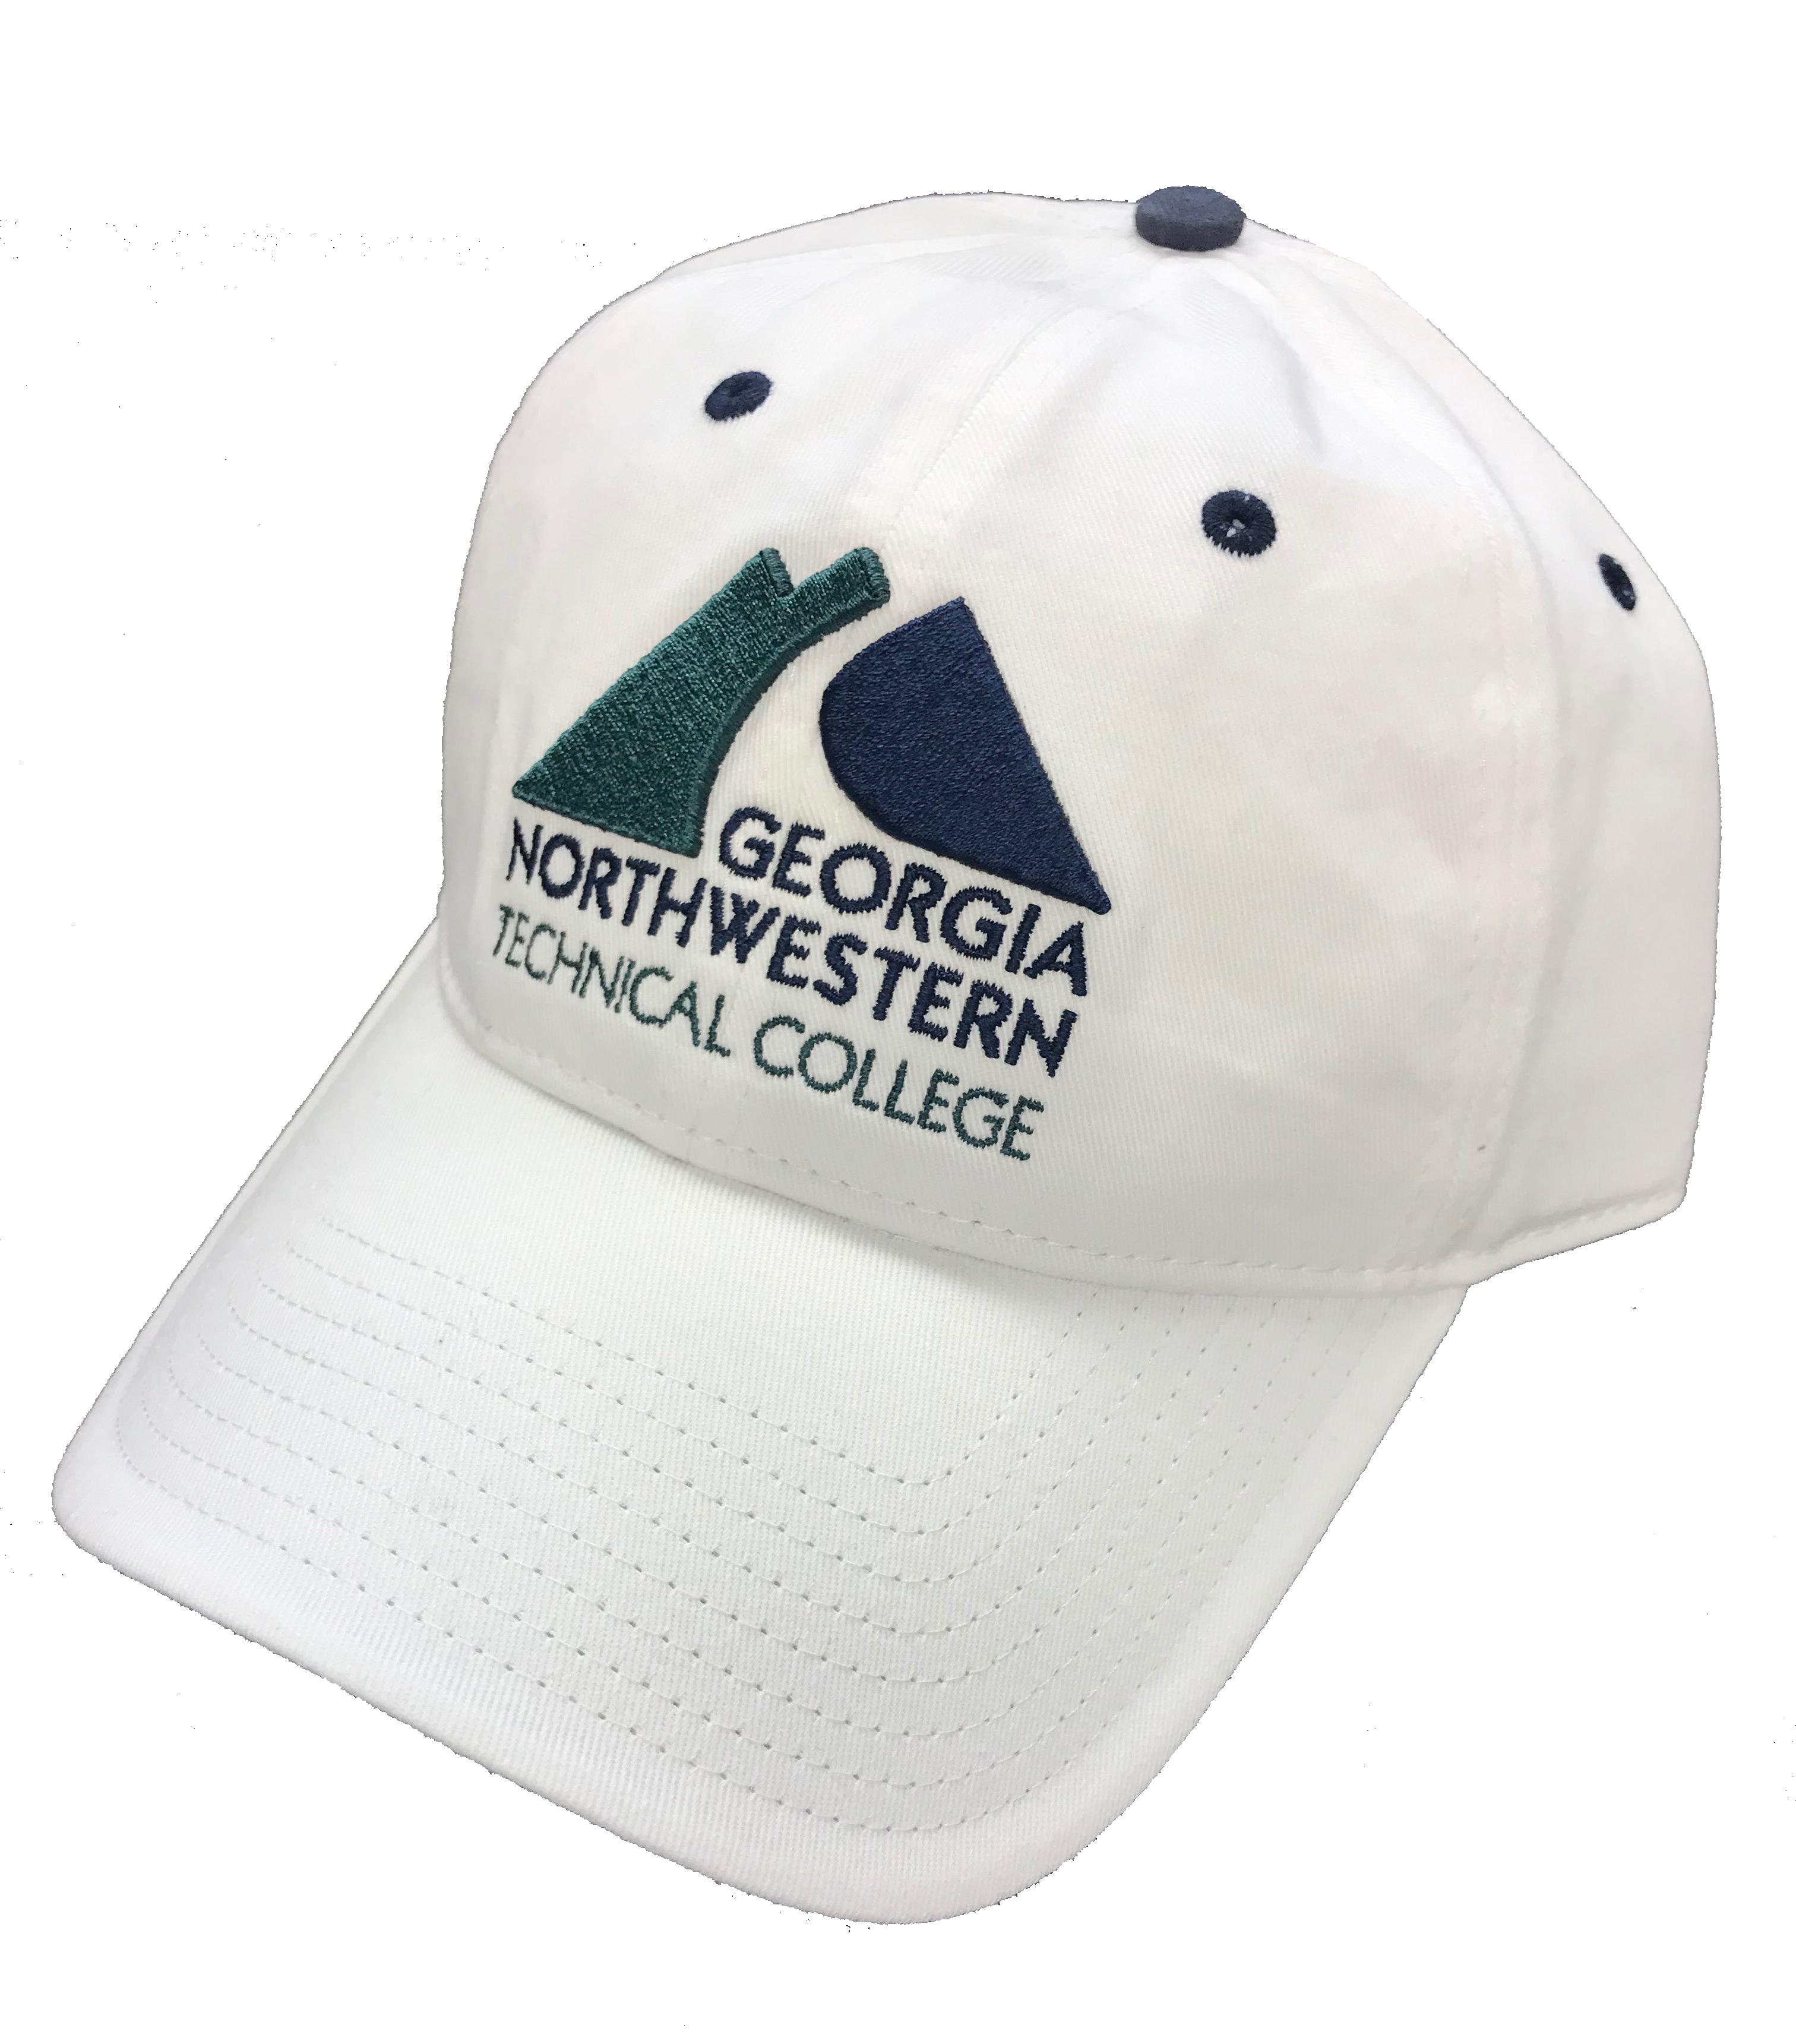 Georgia Northwestern Technical College Adjustable Twill Hat